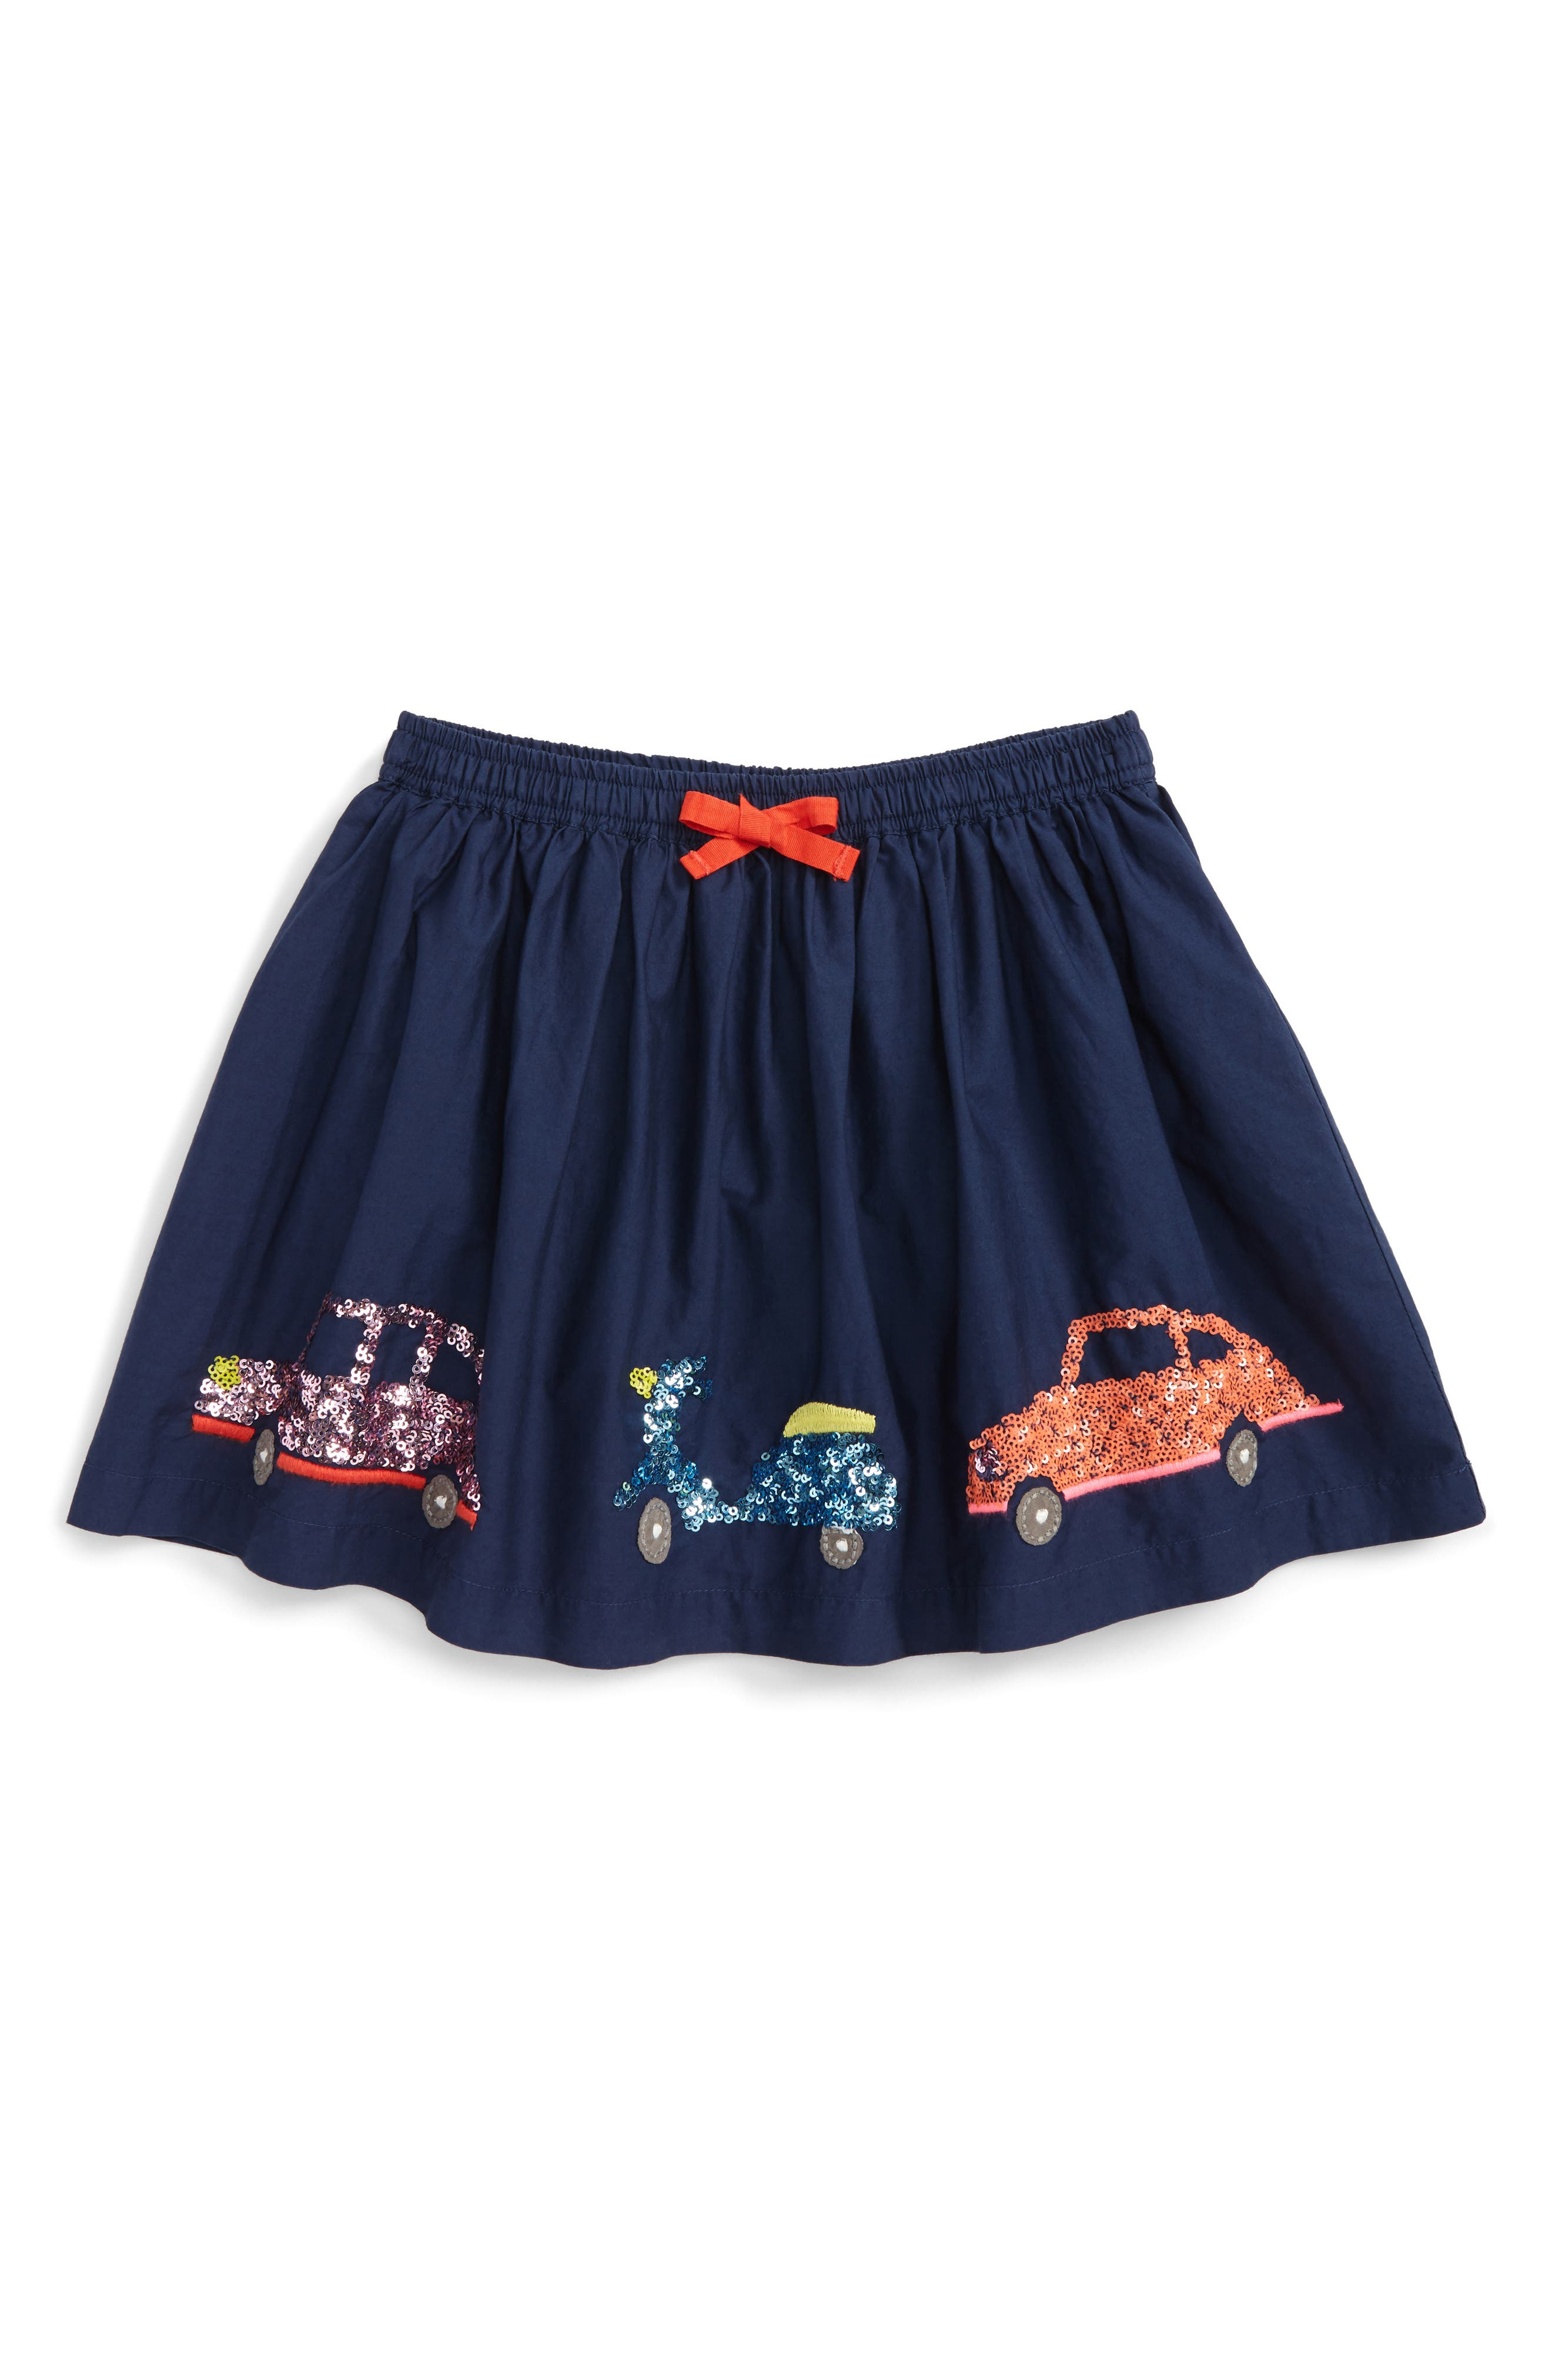 Adventure Sequin Skirt,                             Main thumbnail 1, color,                             School Navy